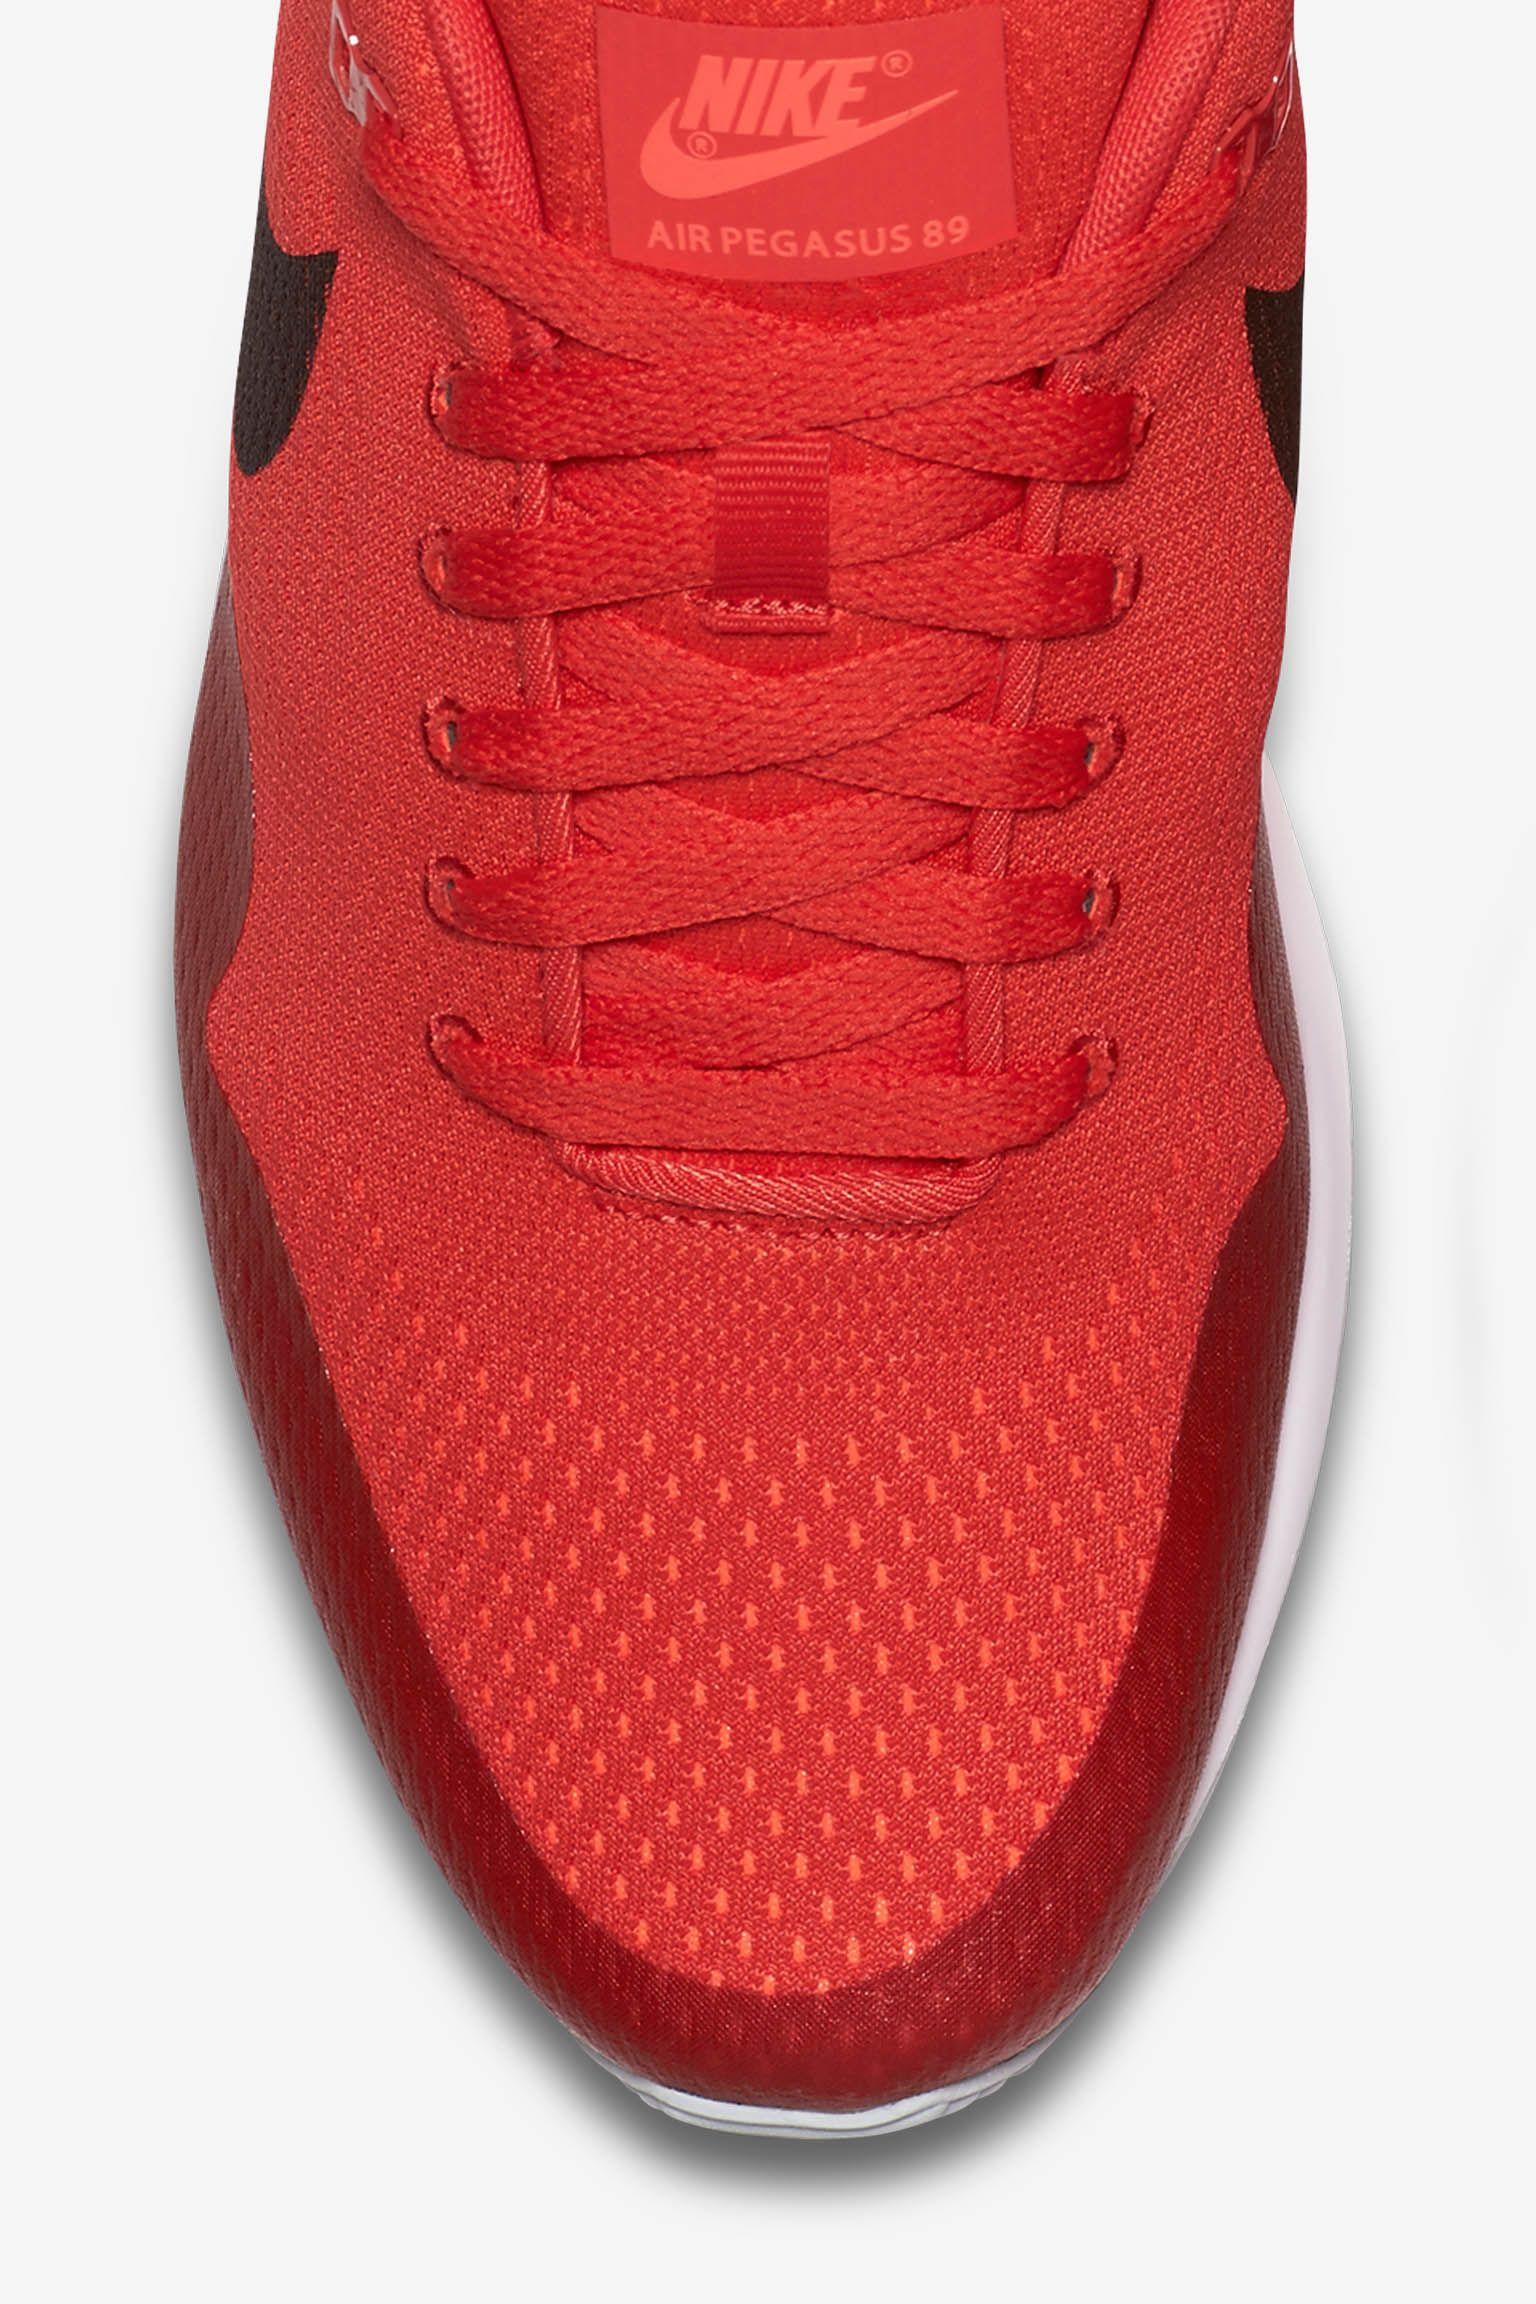 Nike Air Pegasus 89 Engineered